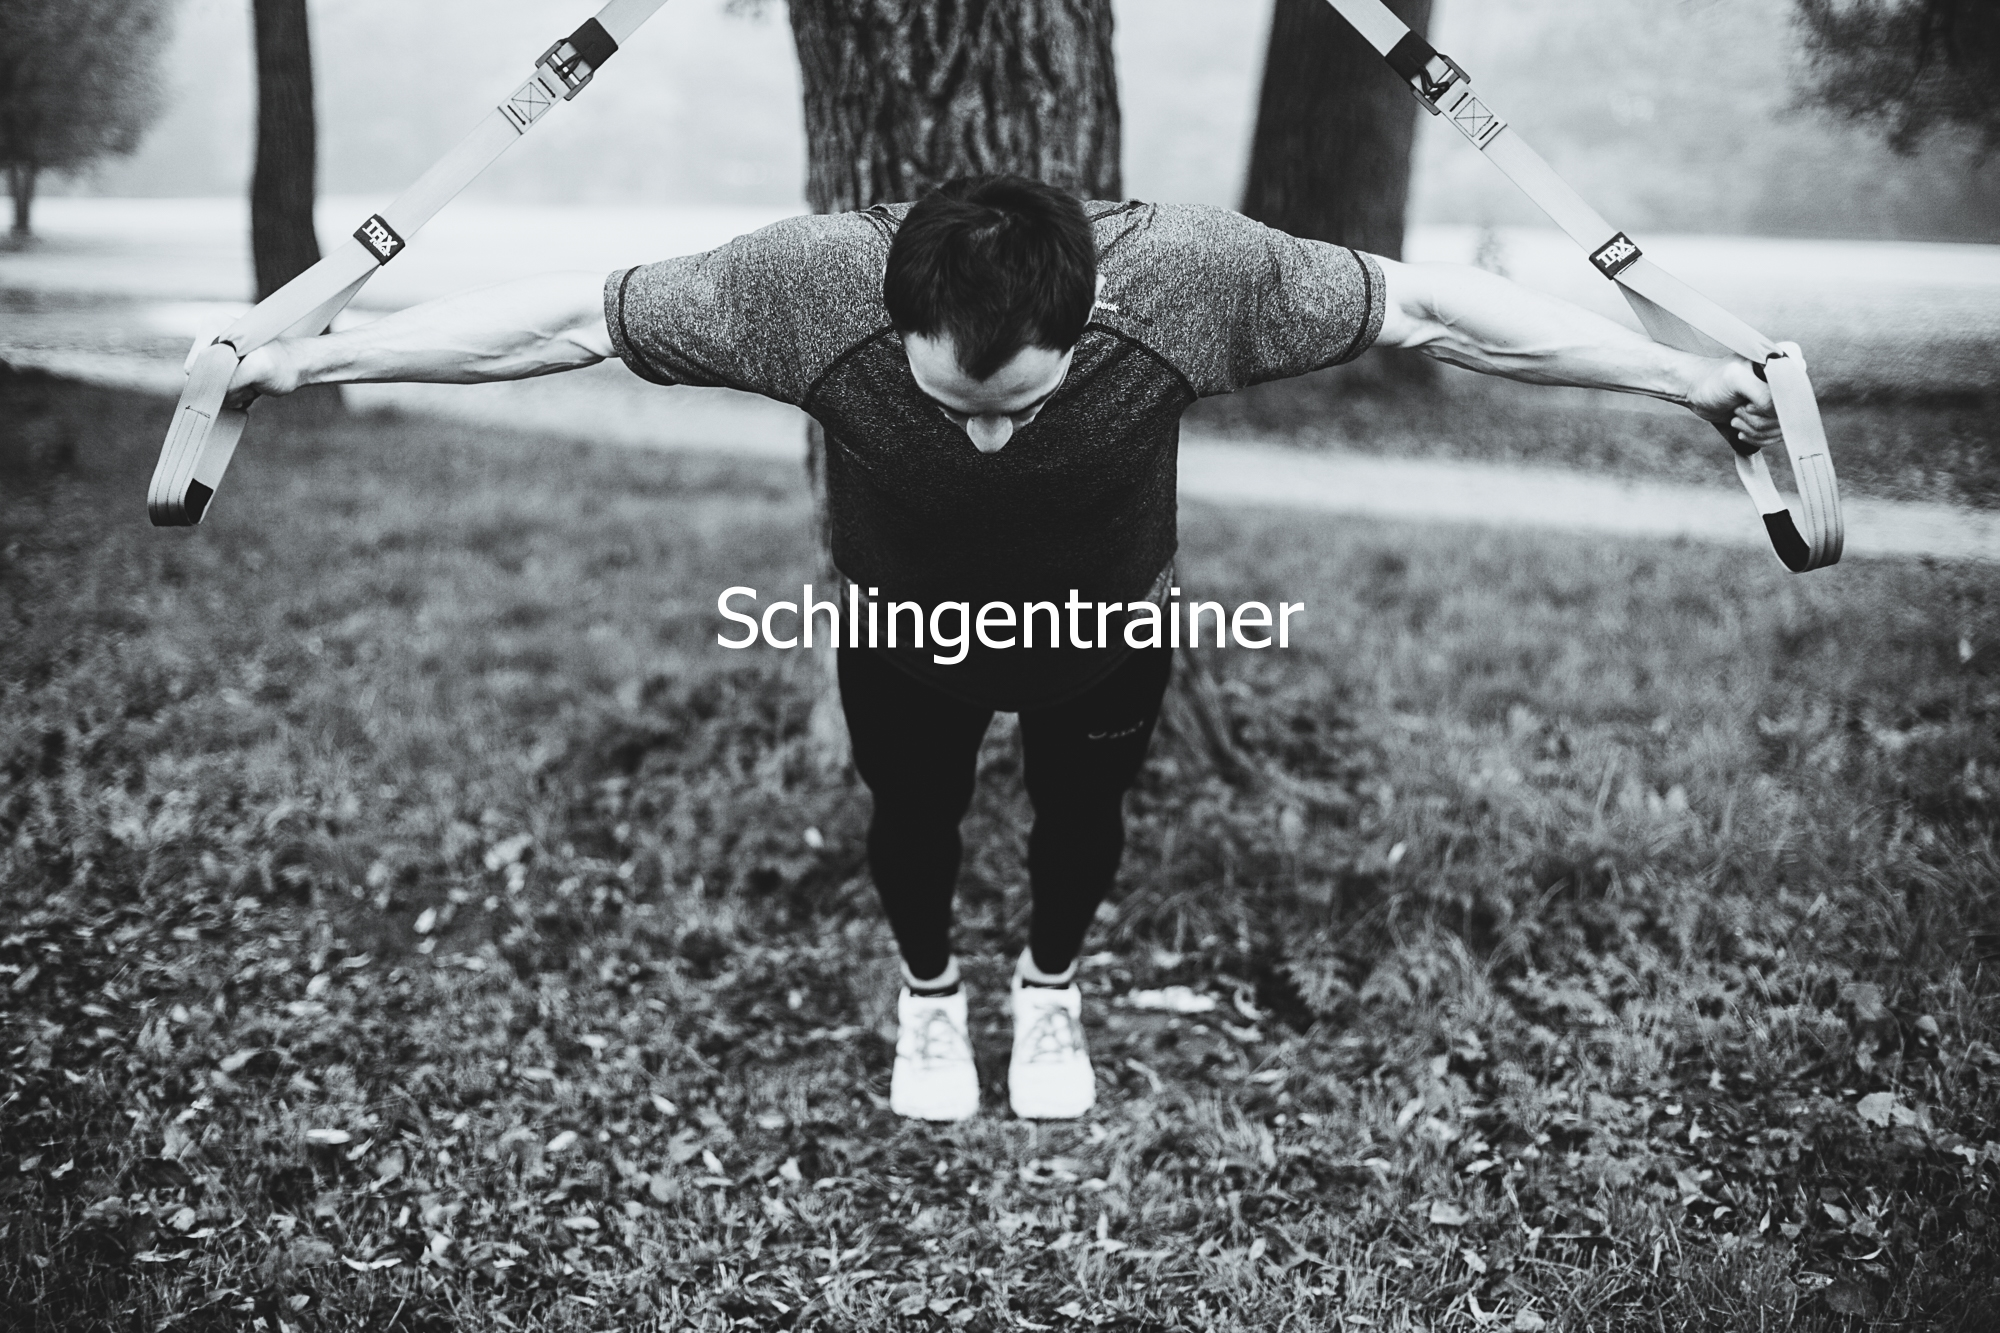 Schlingentrainer